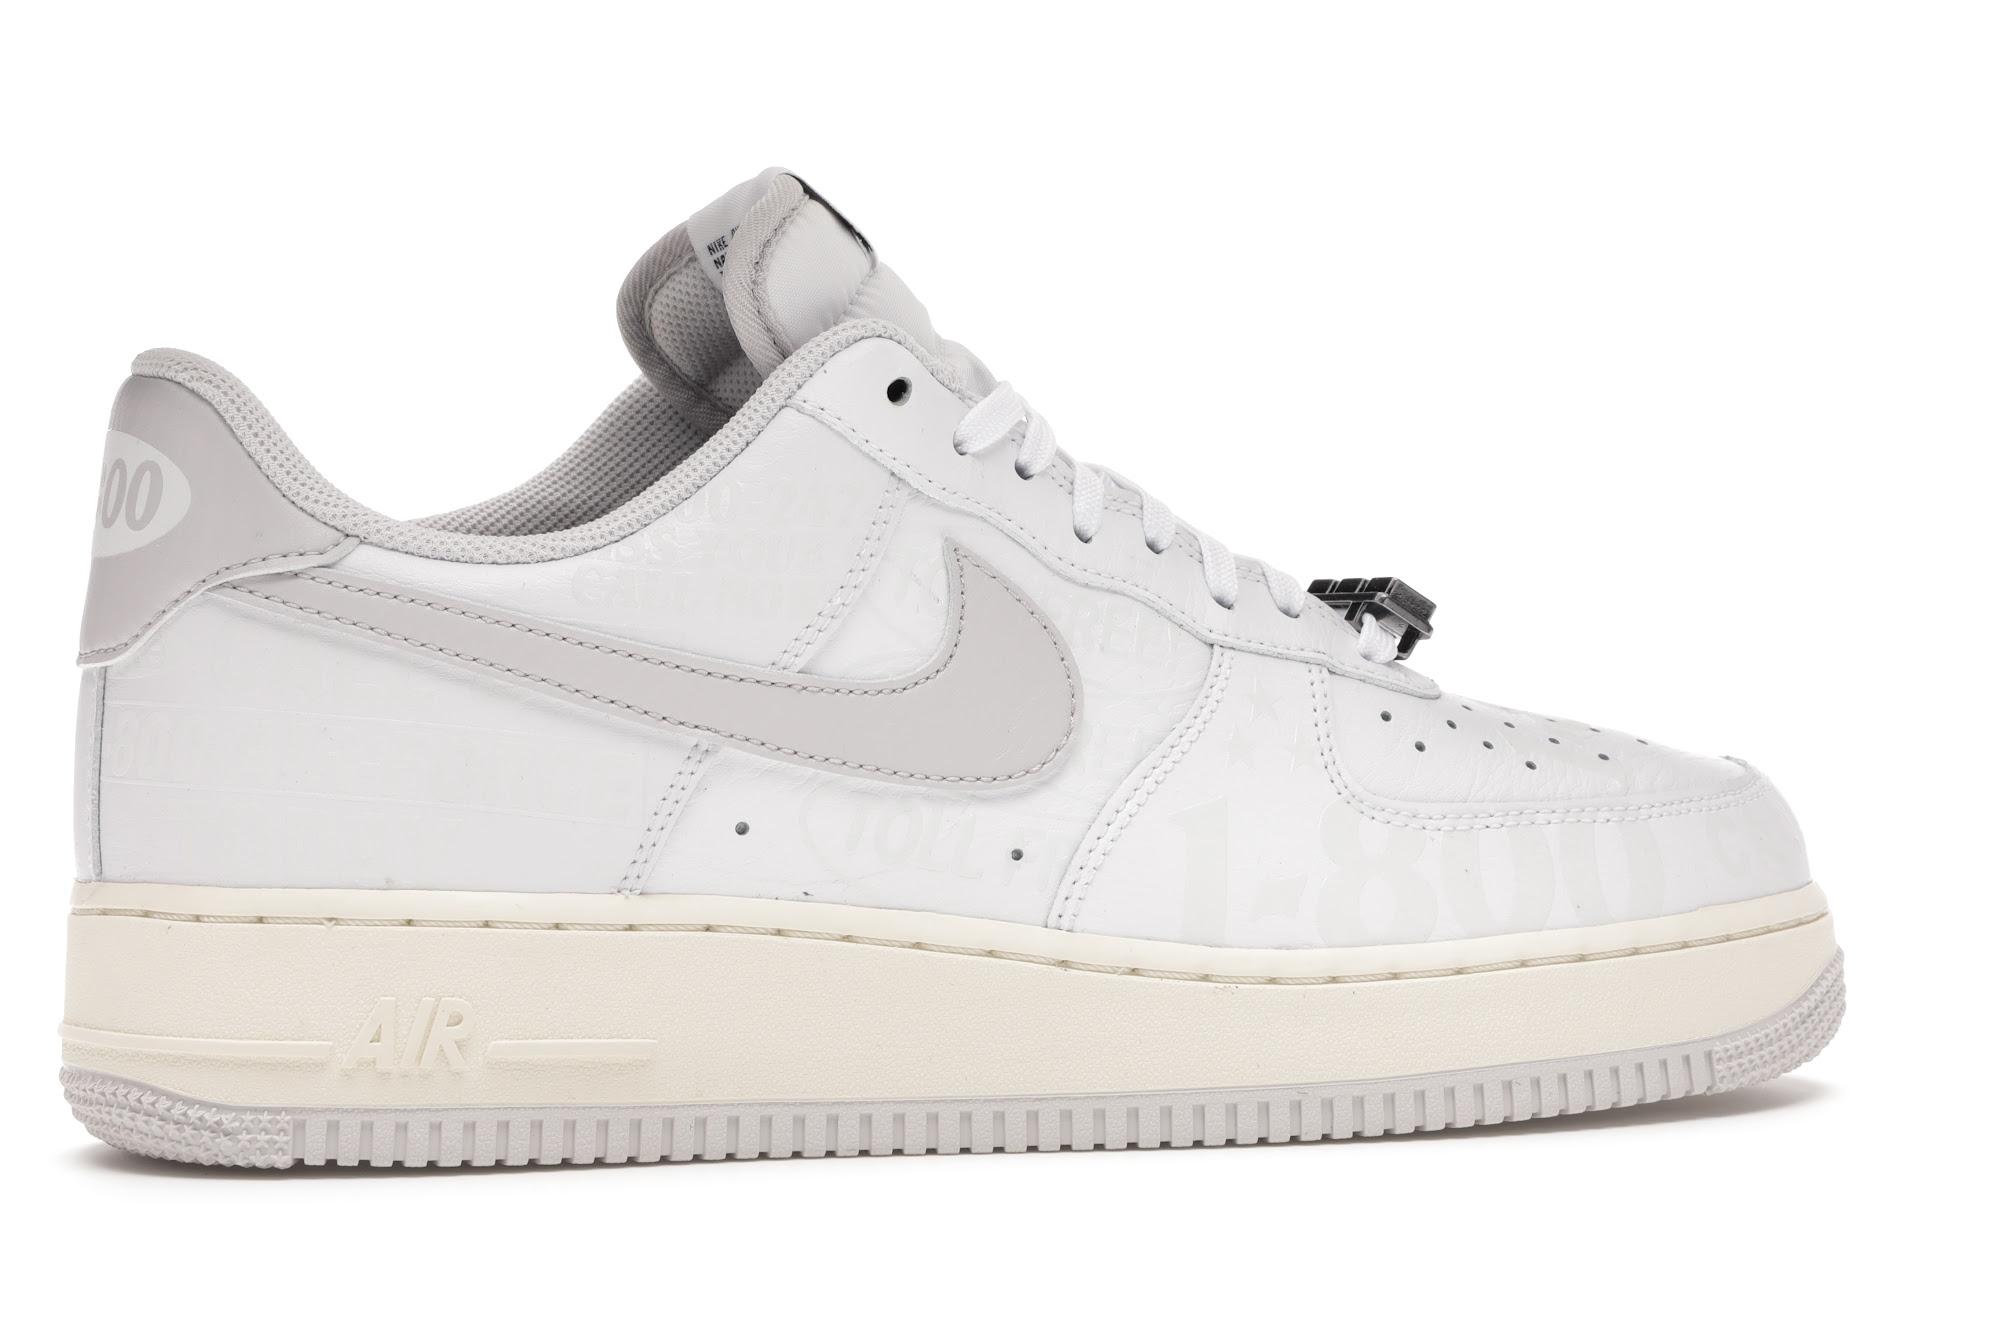 Nike Air Force 1 Low 1-800